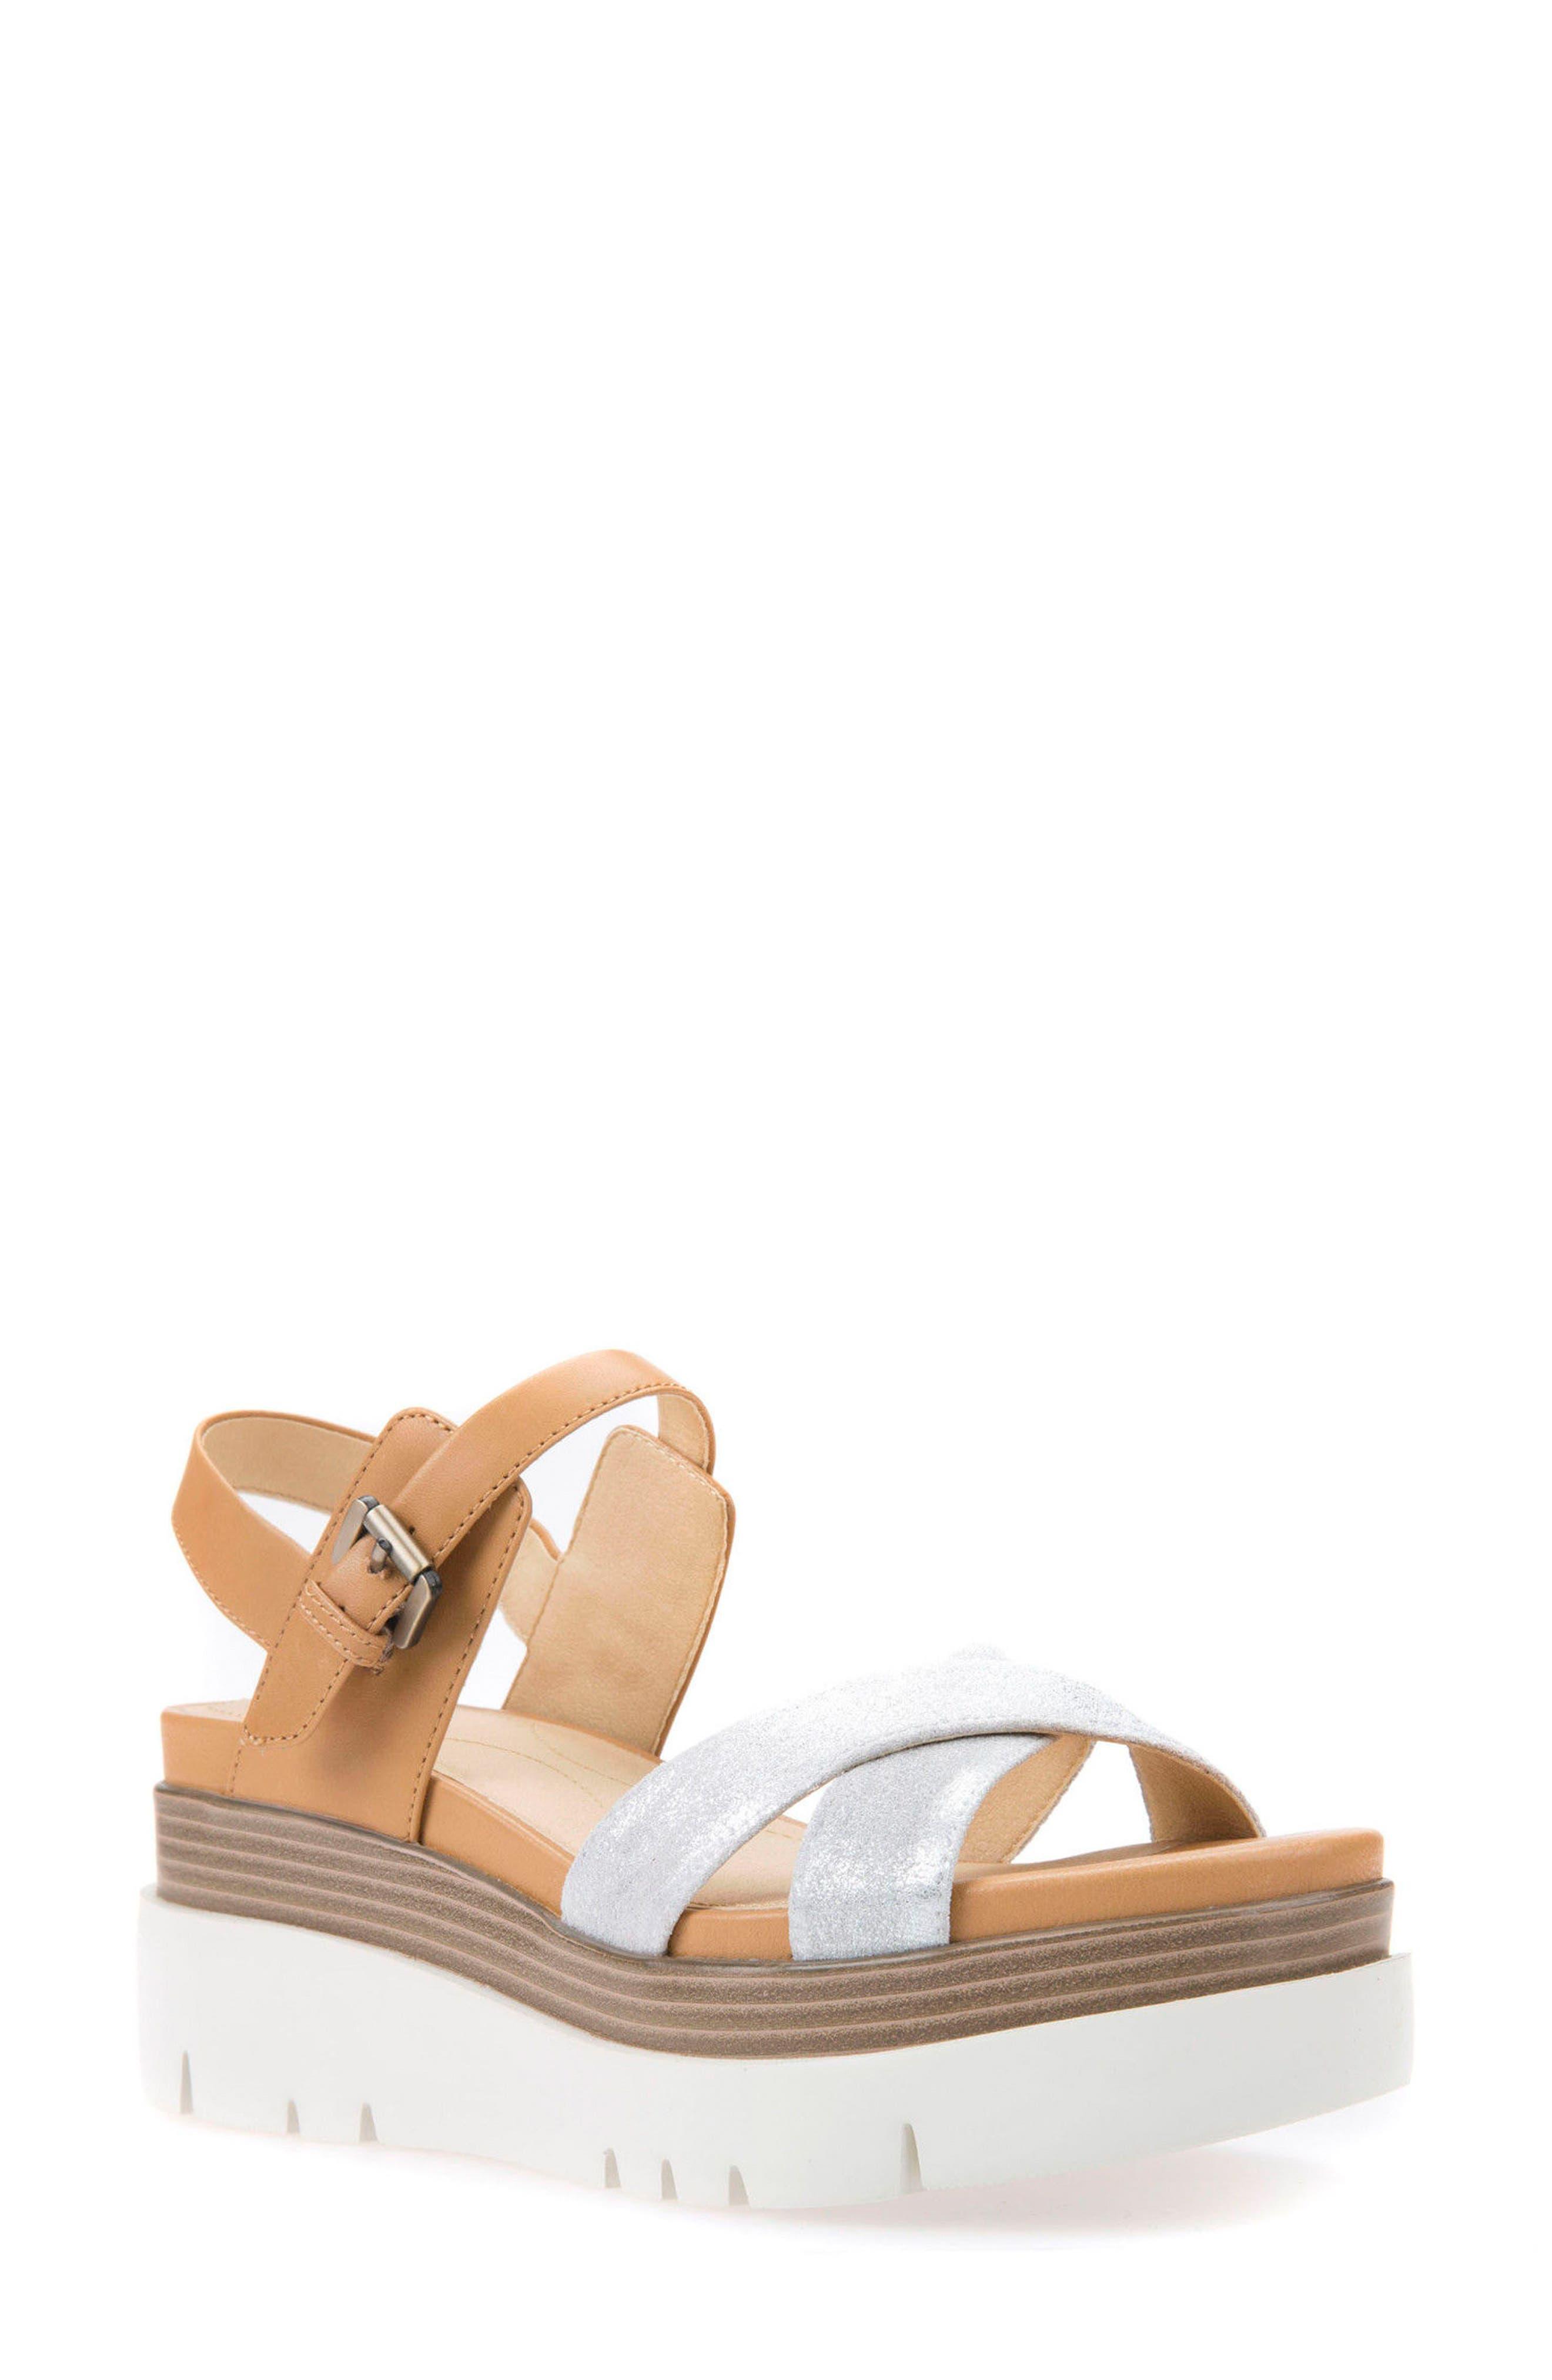 Main Image - Geox Radwa Platform Sandal (Women)